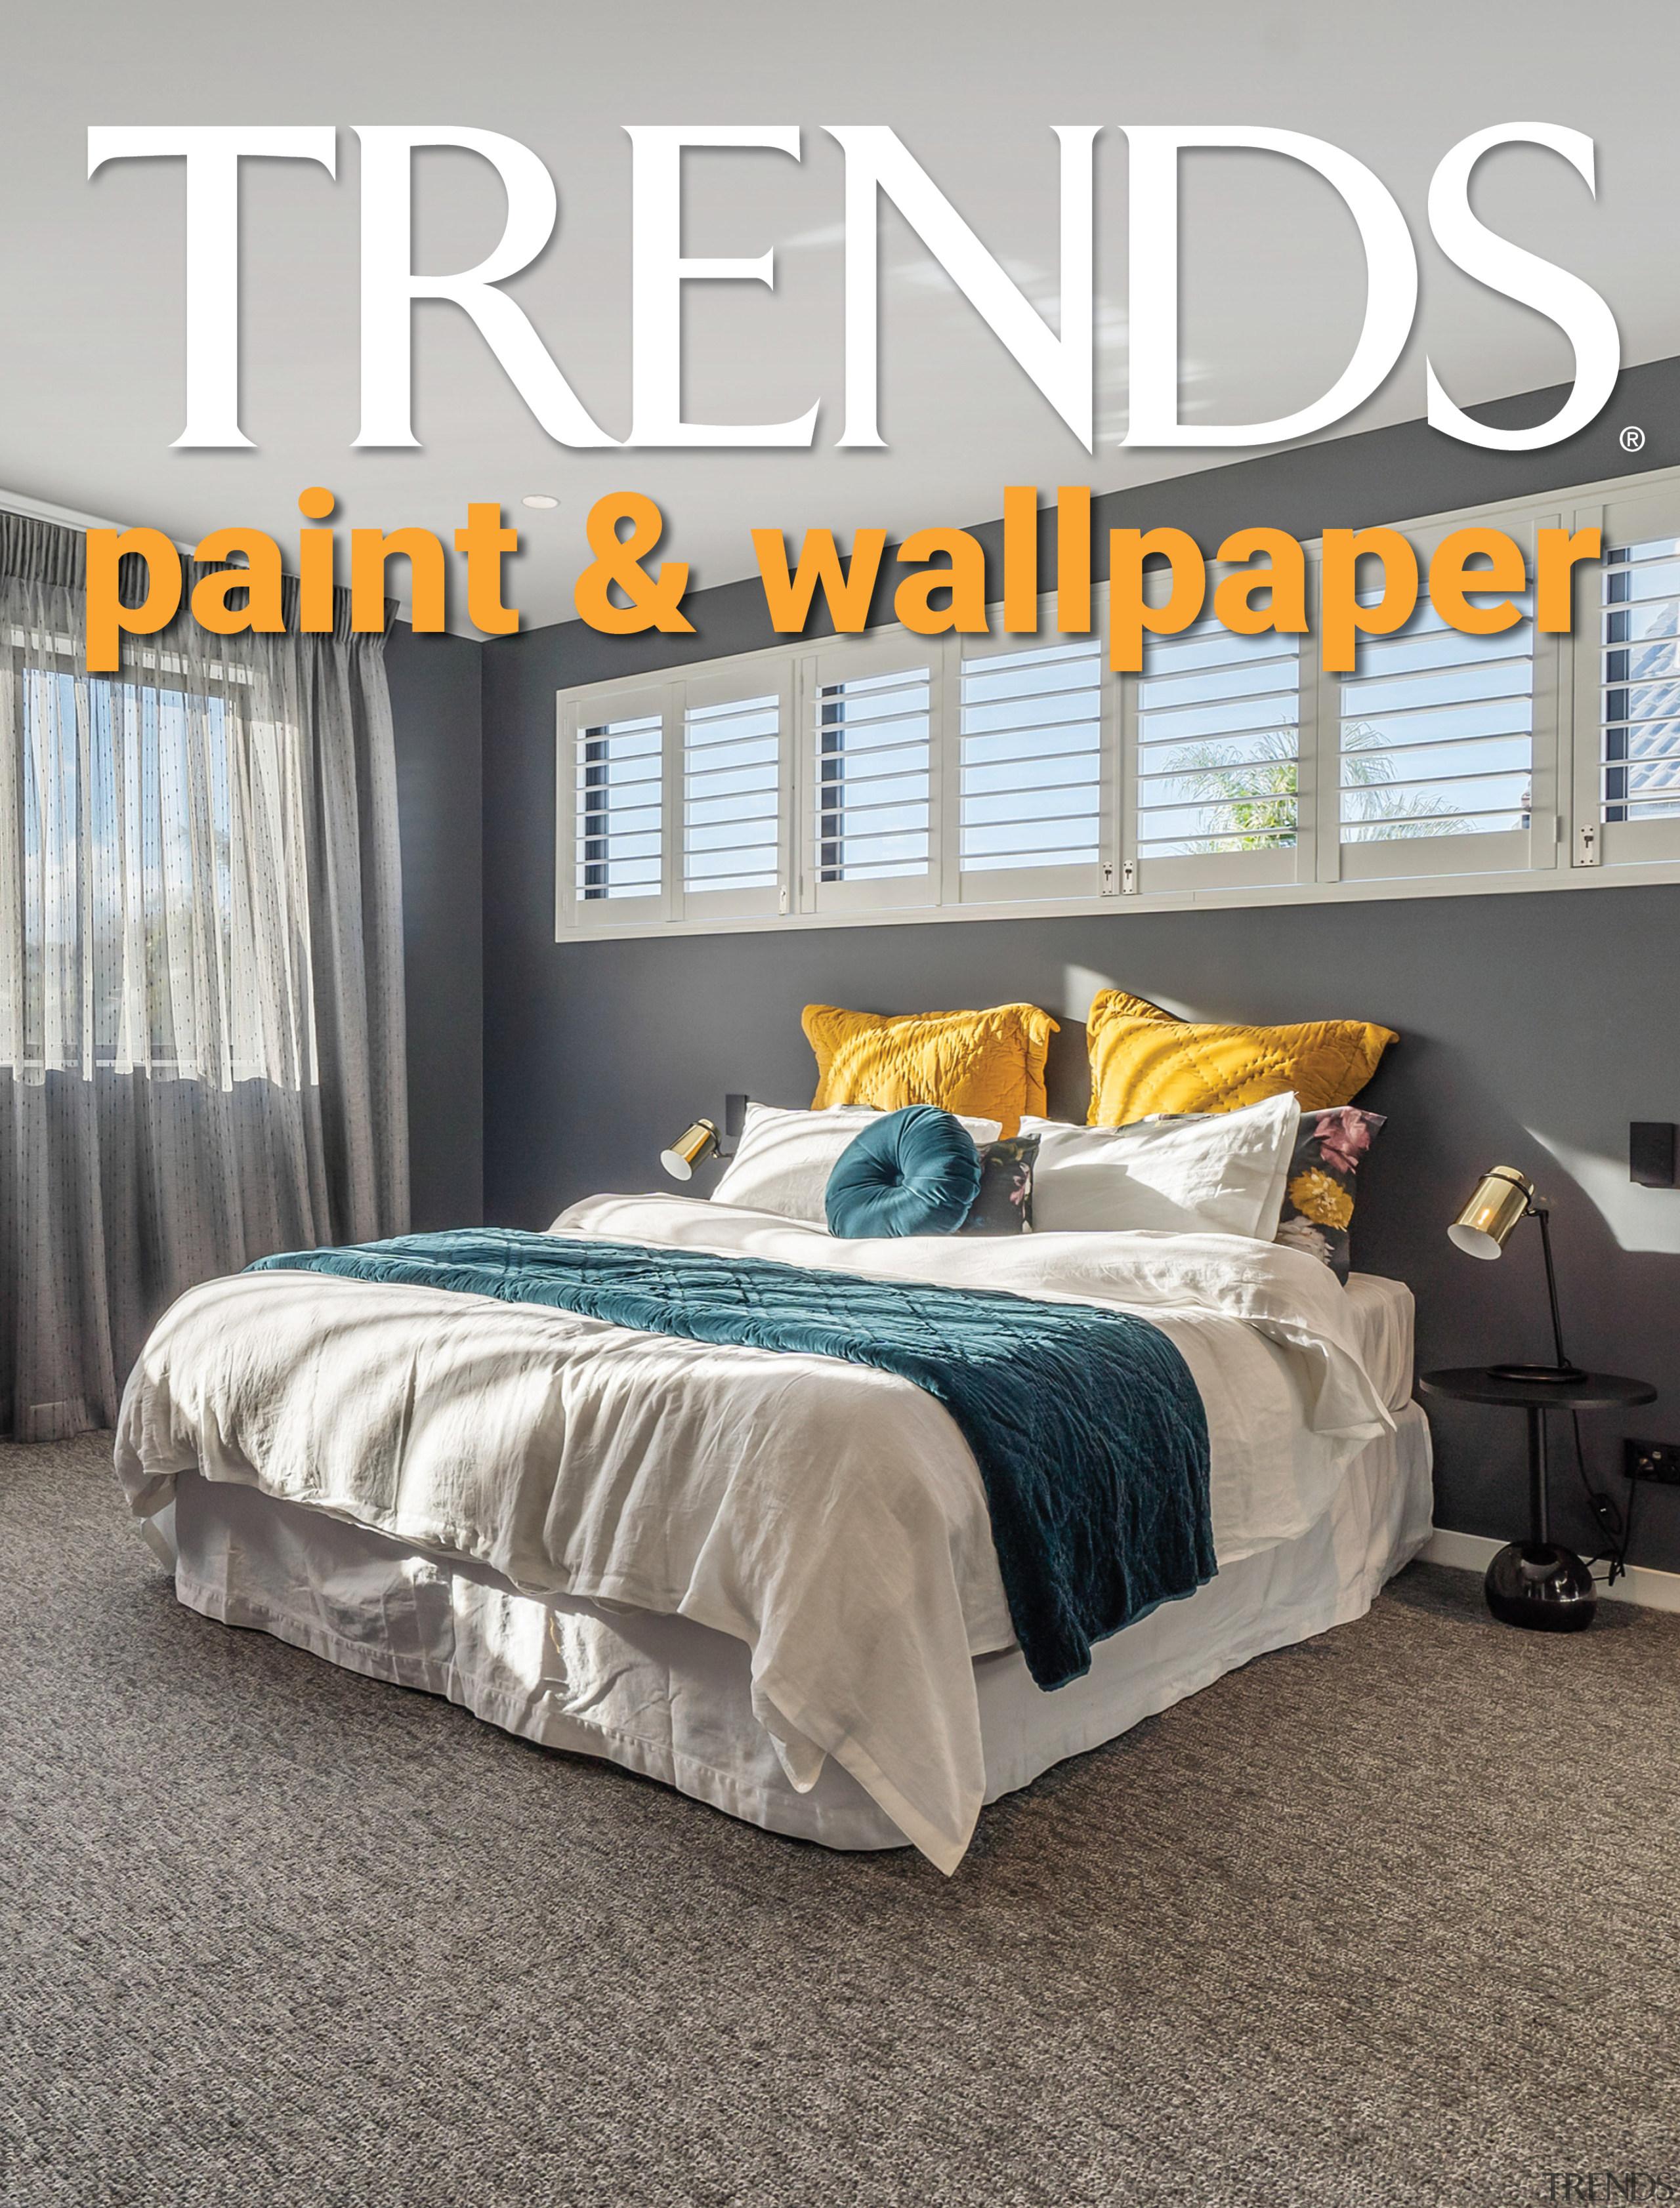 paint & wallpaper -